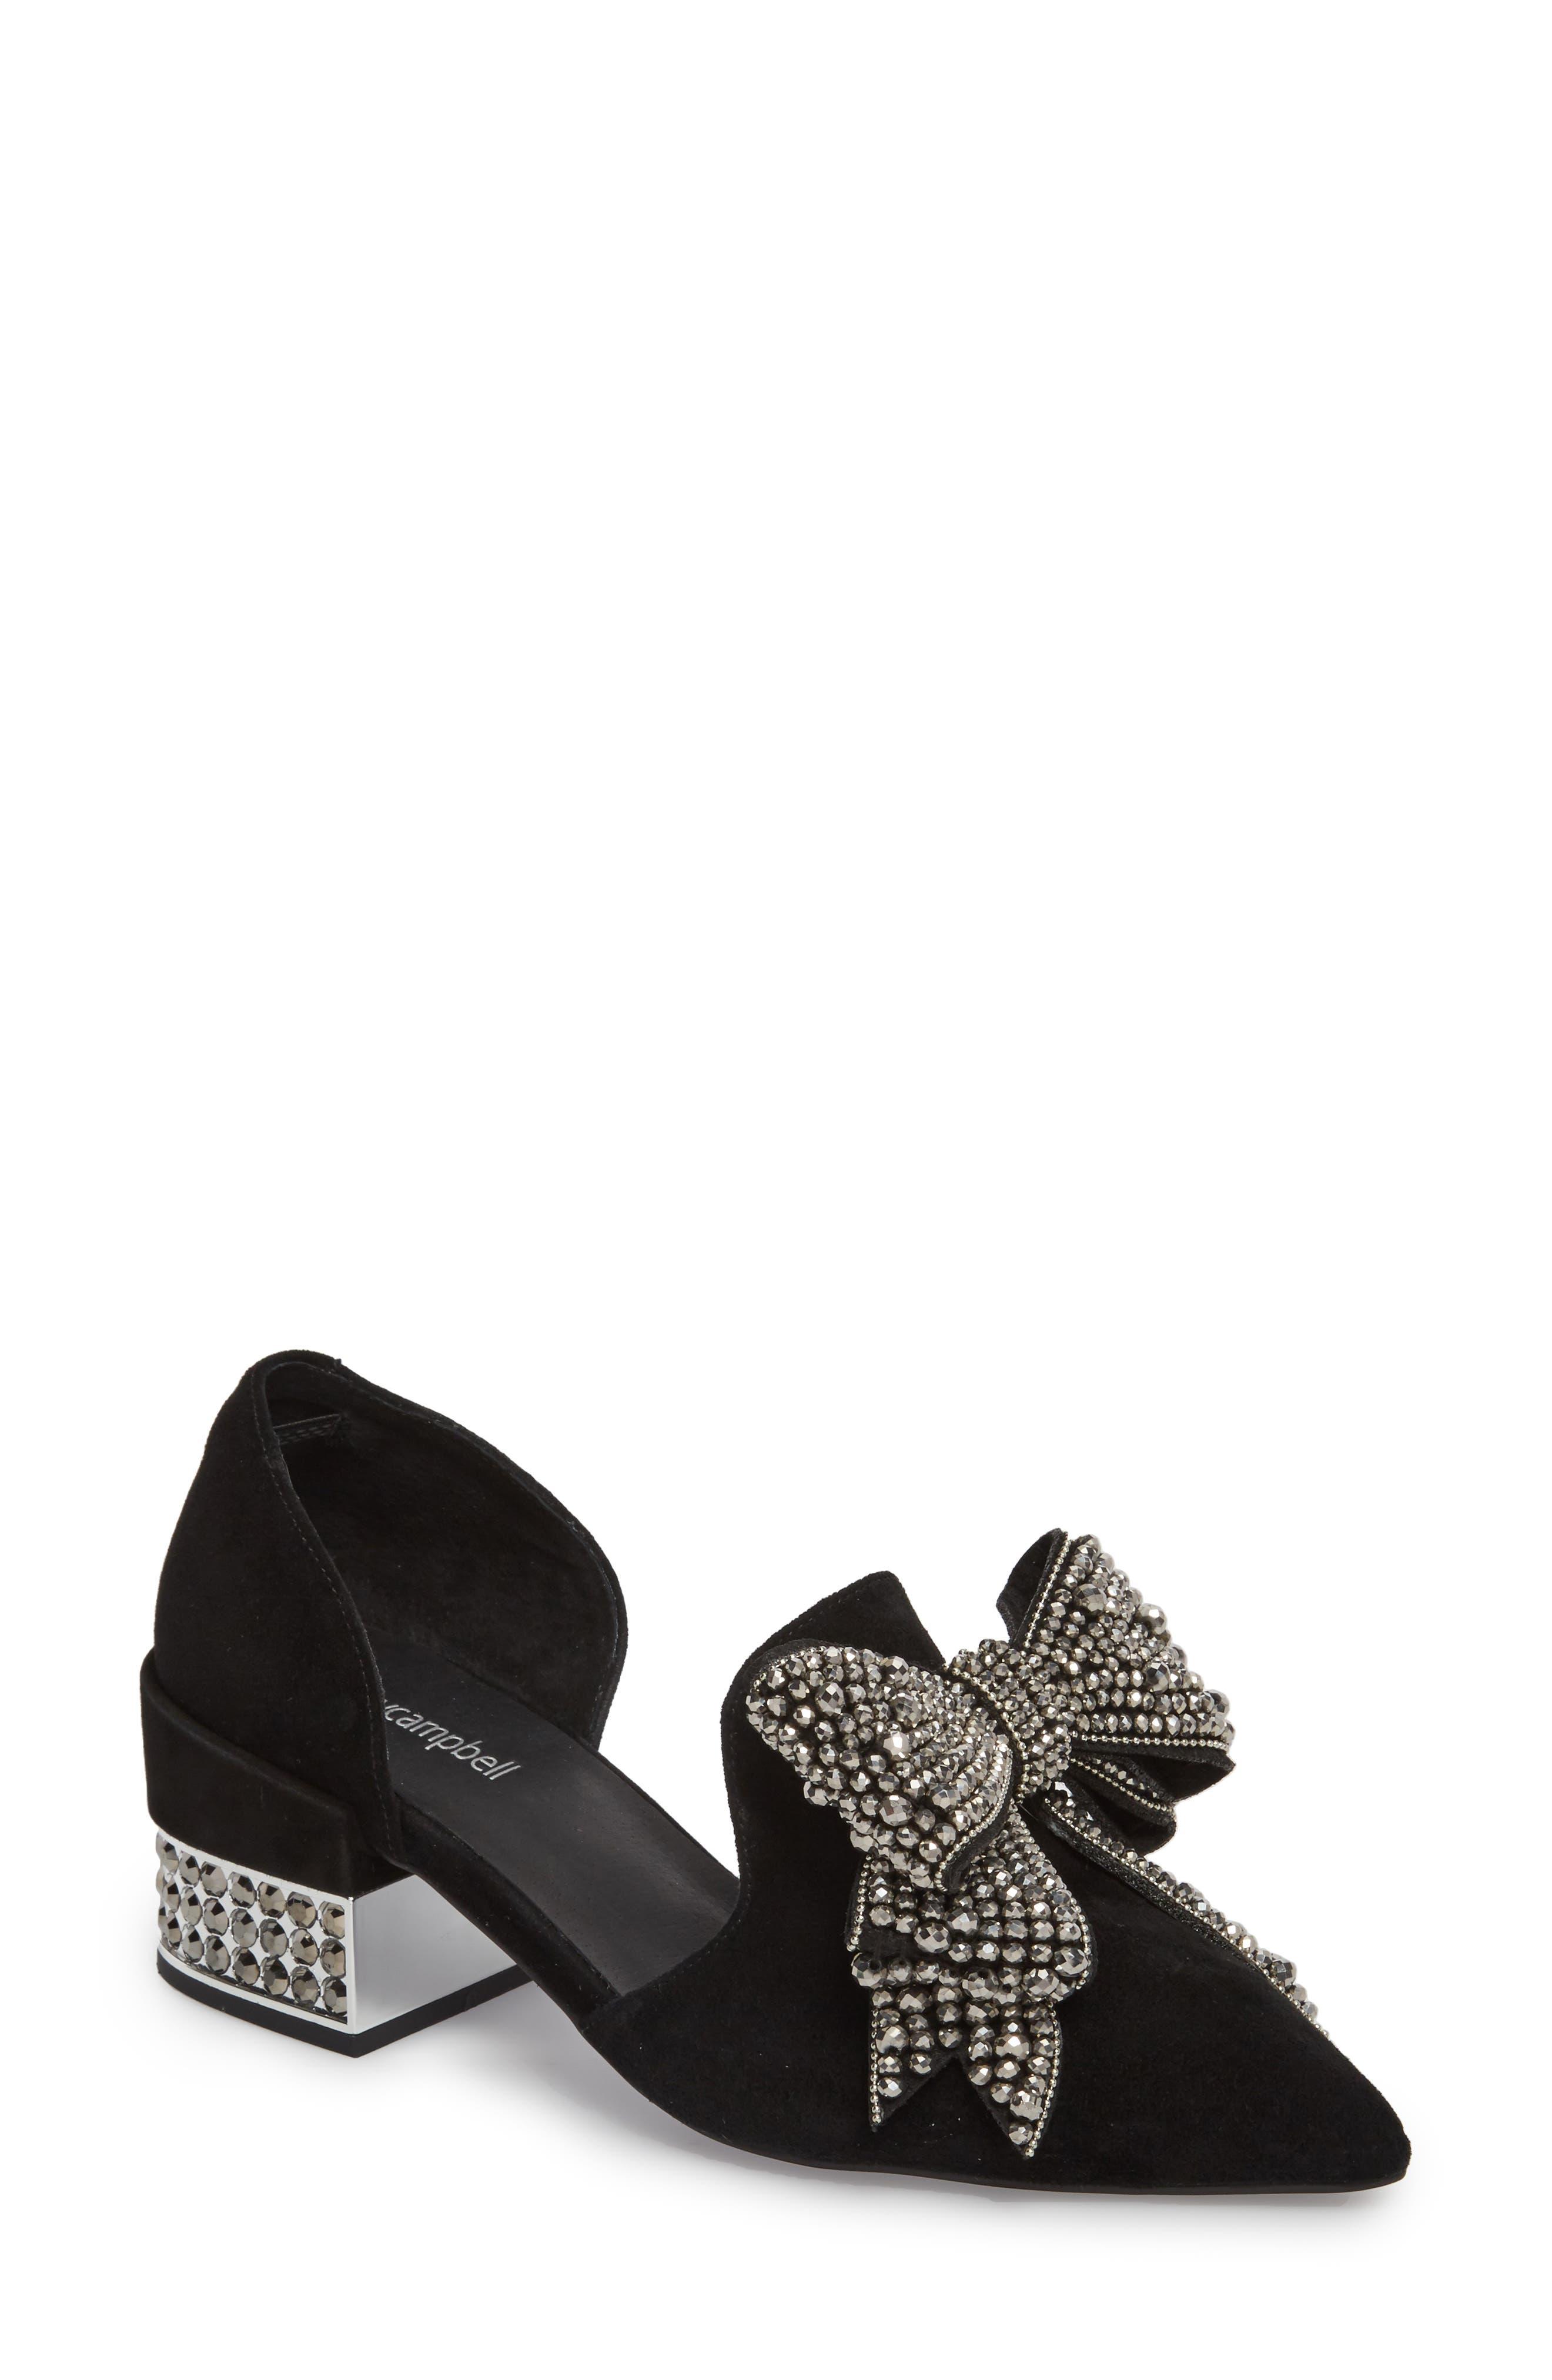 Valenti Embellished Bow Loafer,                         Main,                         color, 001